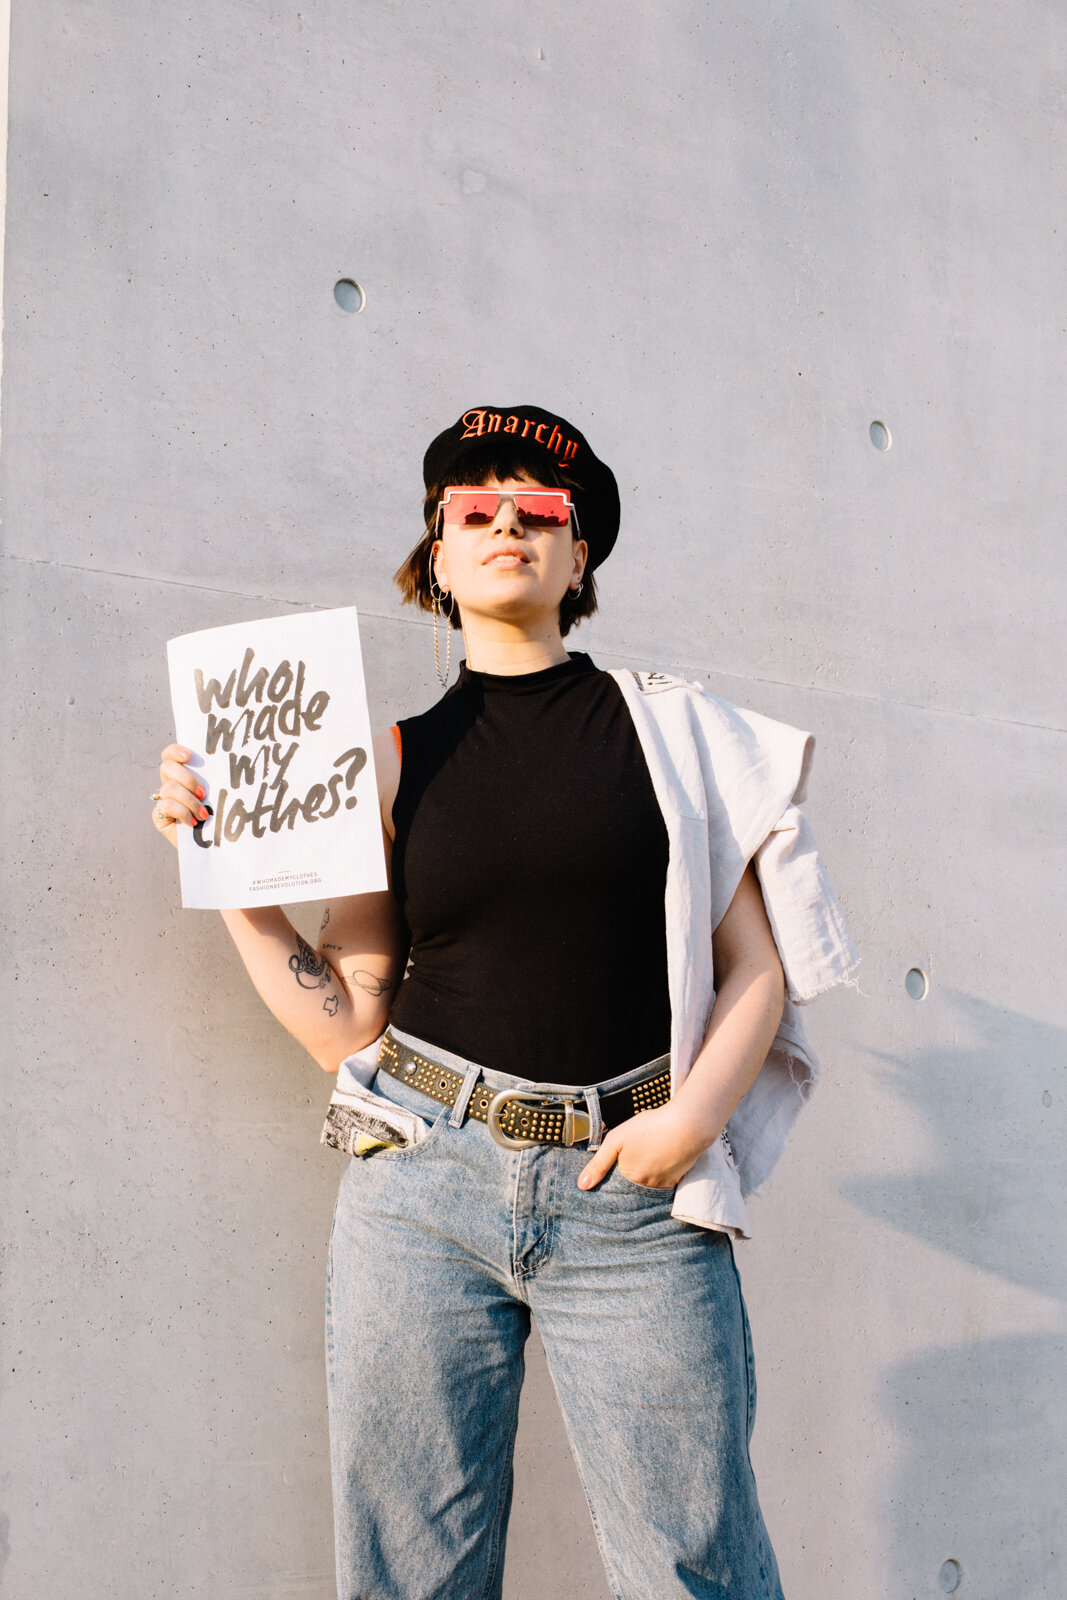 fashion-revolution-by-cherie-birkner-166.jpg